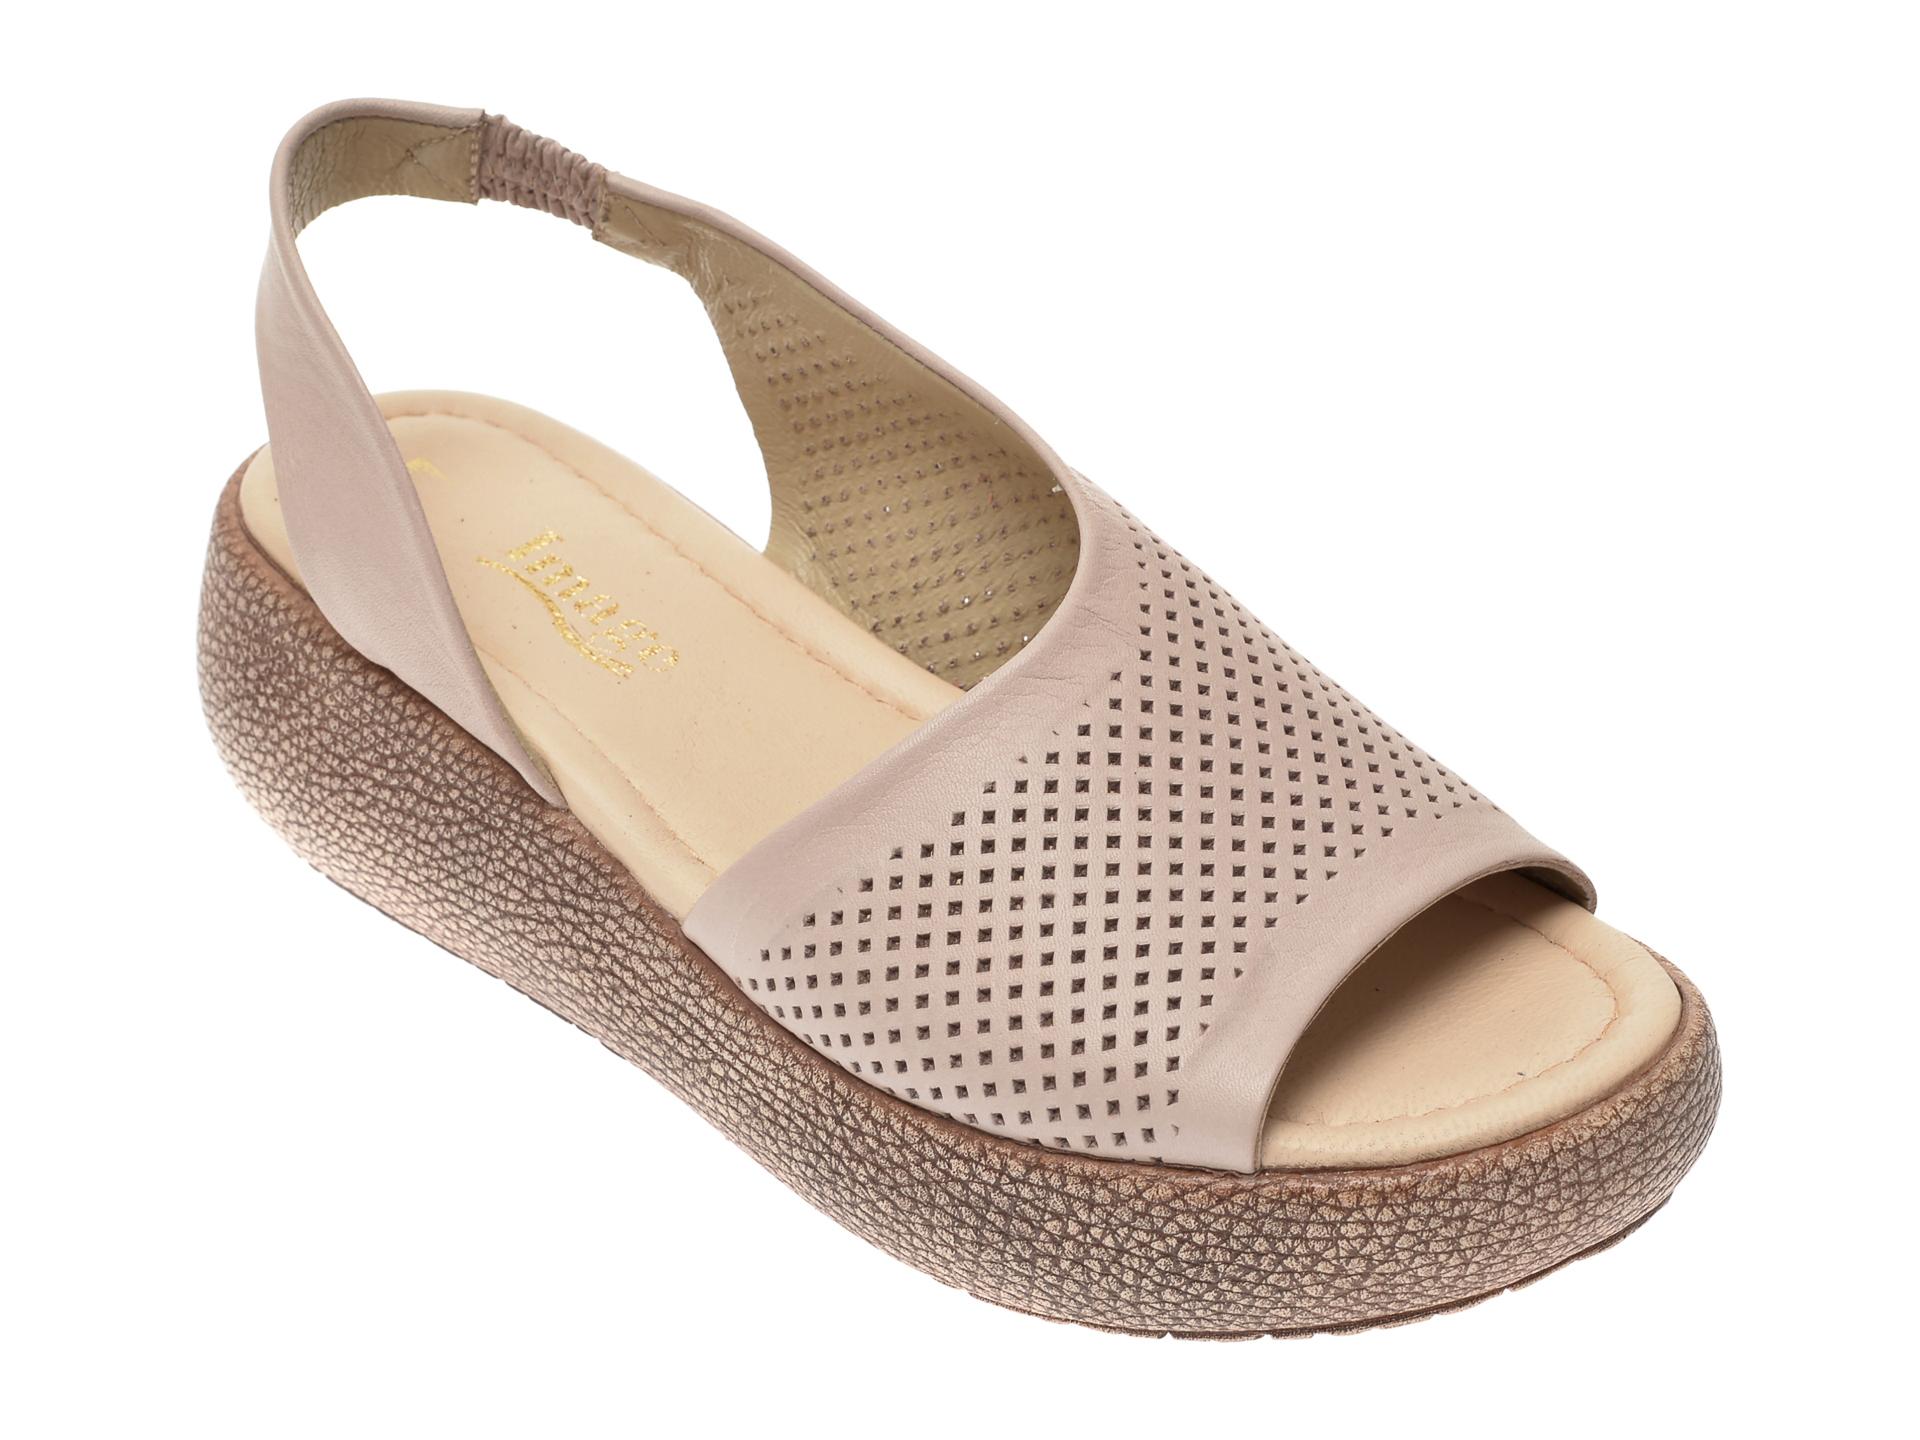 Sandale IMAGE gri, 6033, din piele naturala imagine